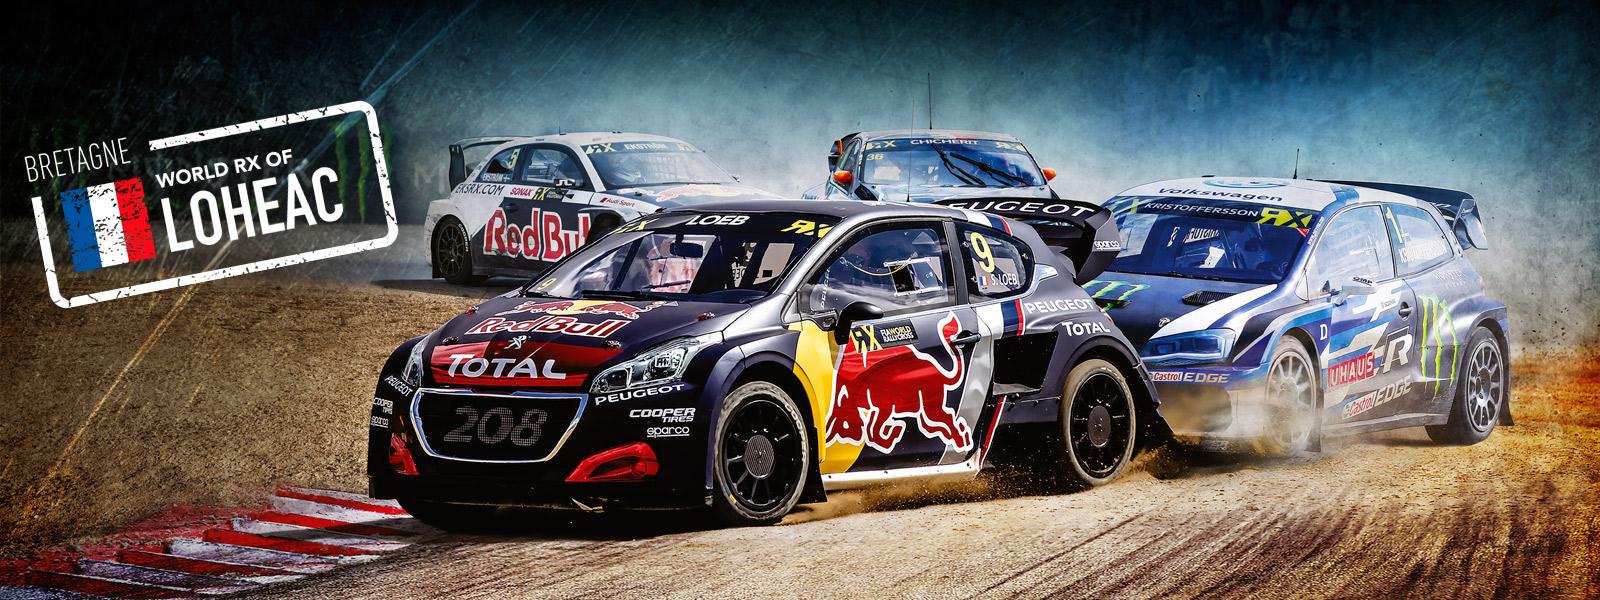 rx lohéac rallycross 2018 monde fia